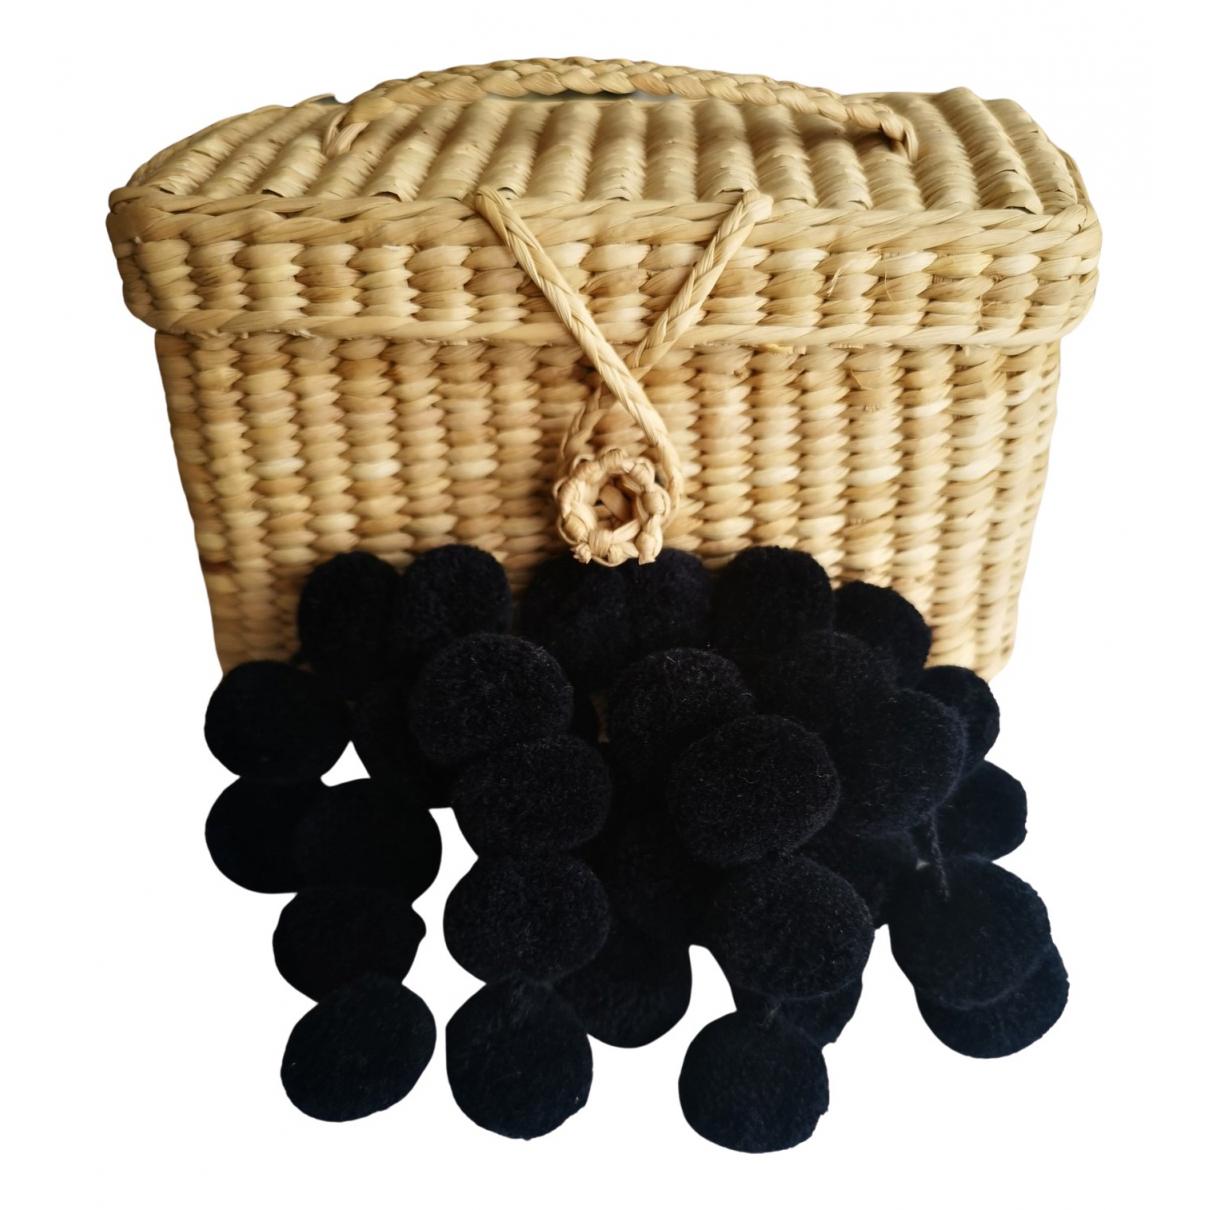 Nannacay \N Beige Wicker handbag for Women \N